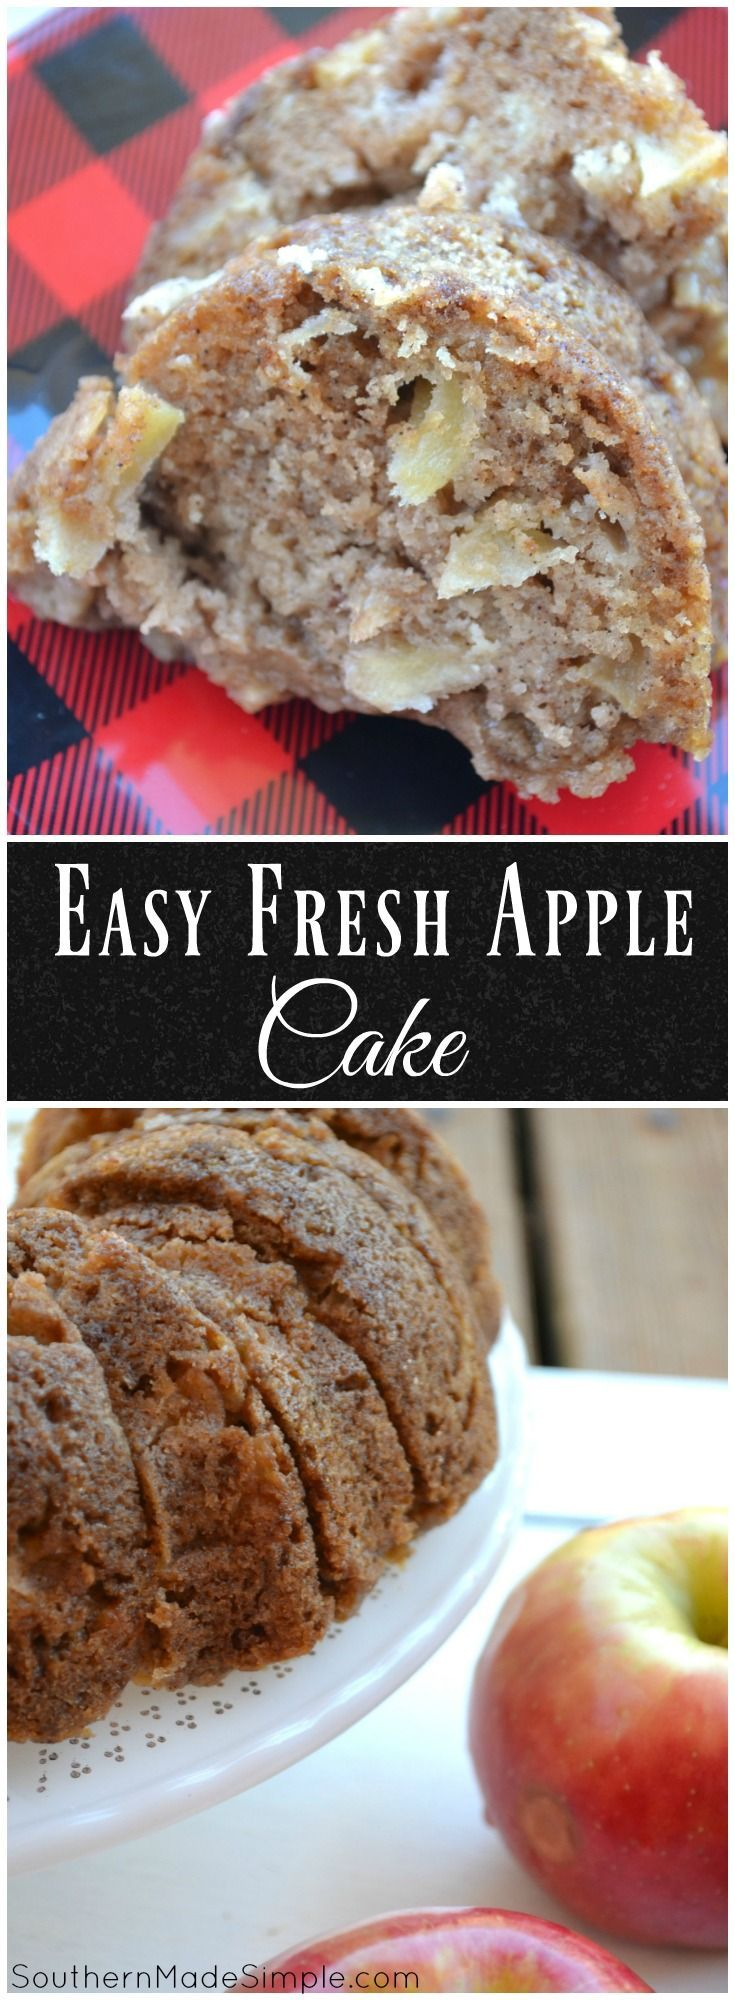 Cinnamon Sugar Apple Cake Recipe Cinnamon apples